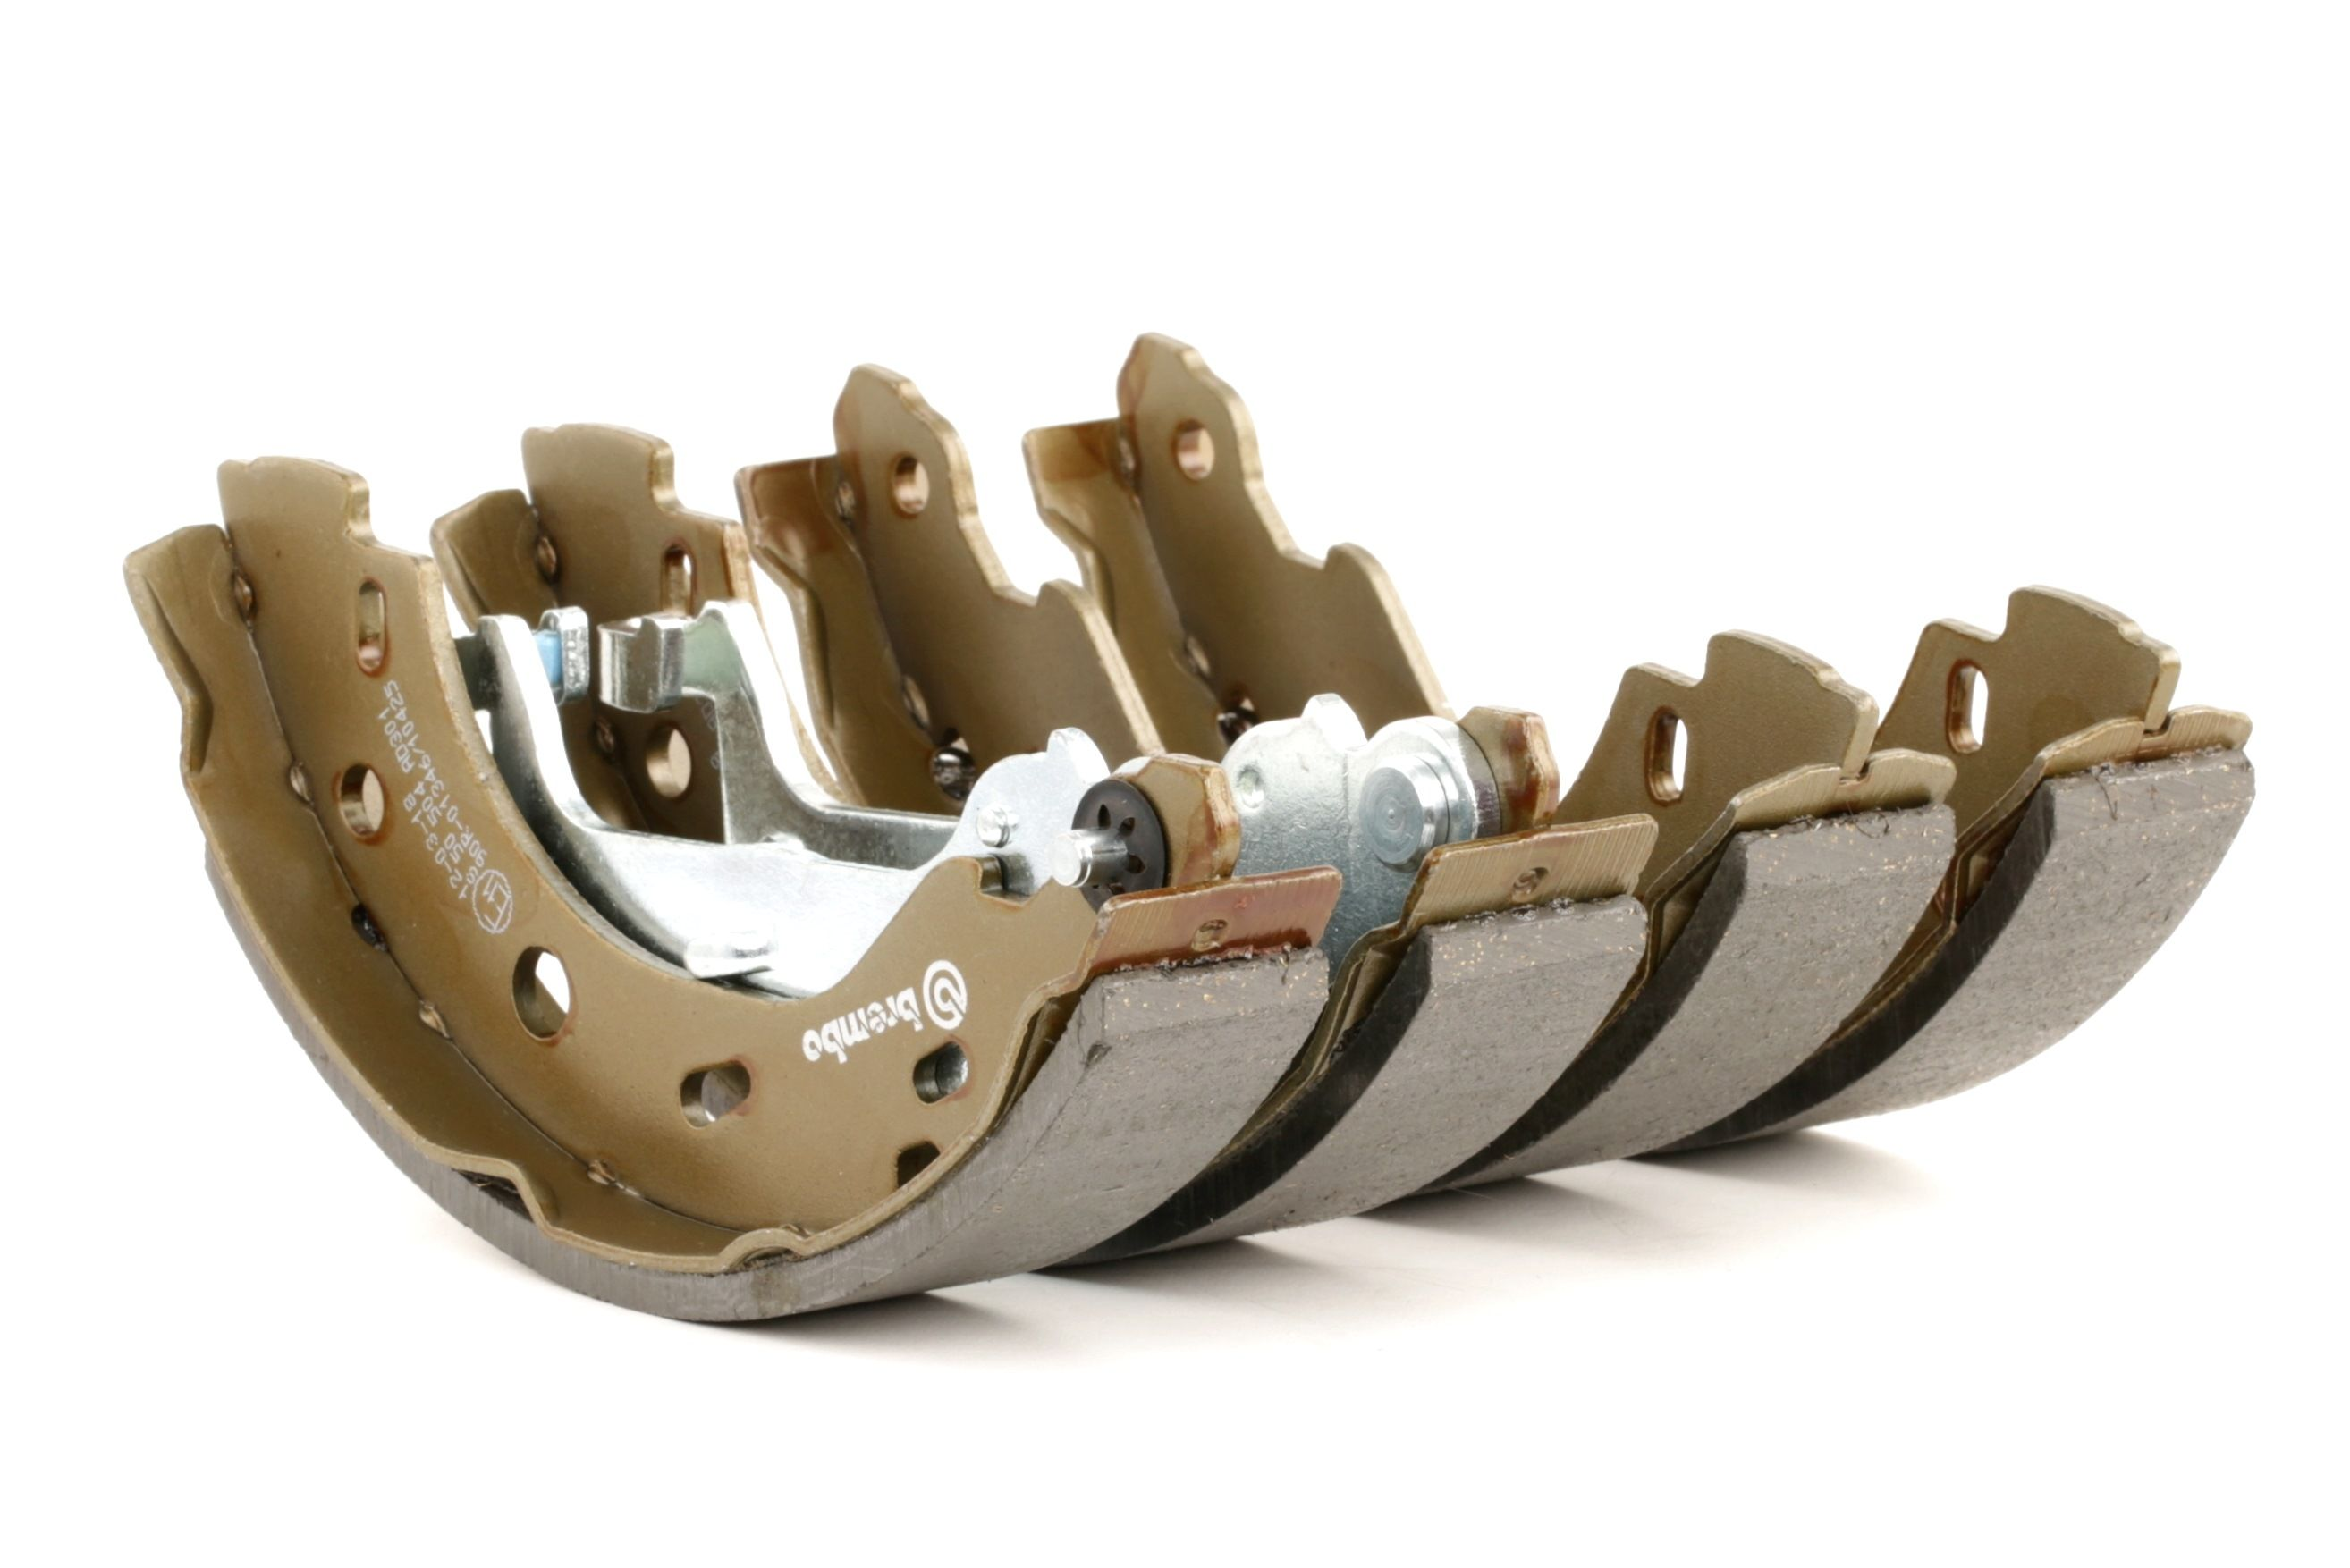 BREMBO: Original Trommelbremse S 50 504 (Breite: 32mm)